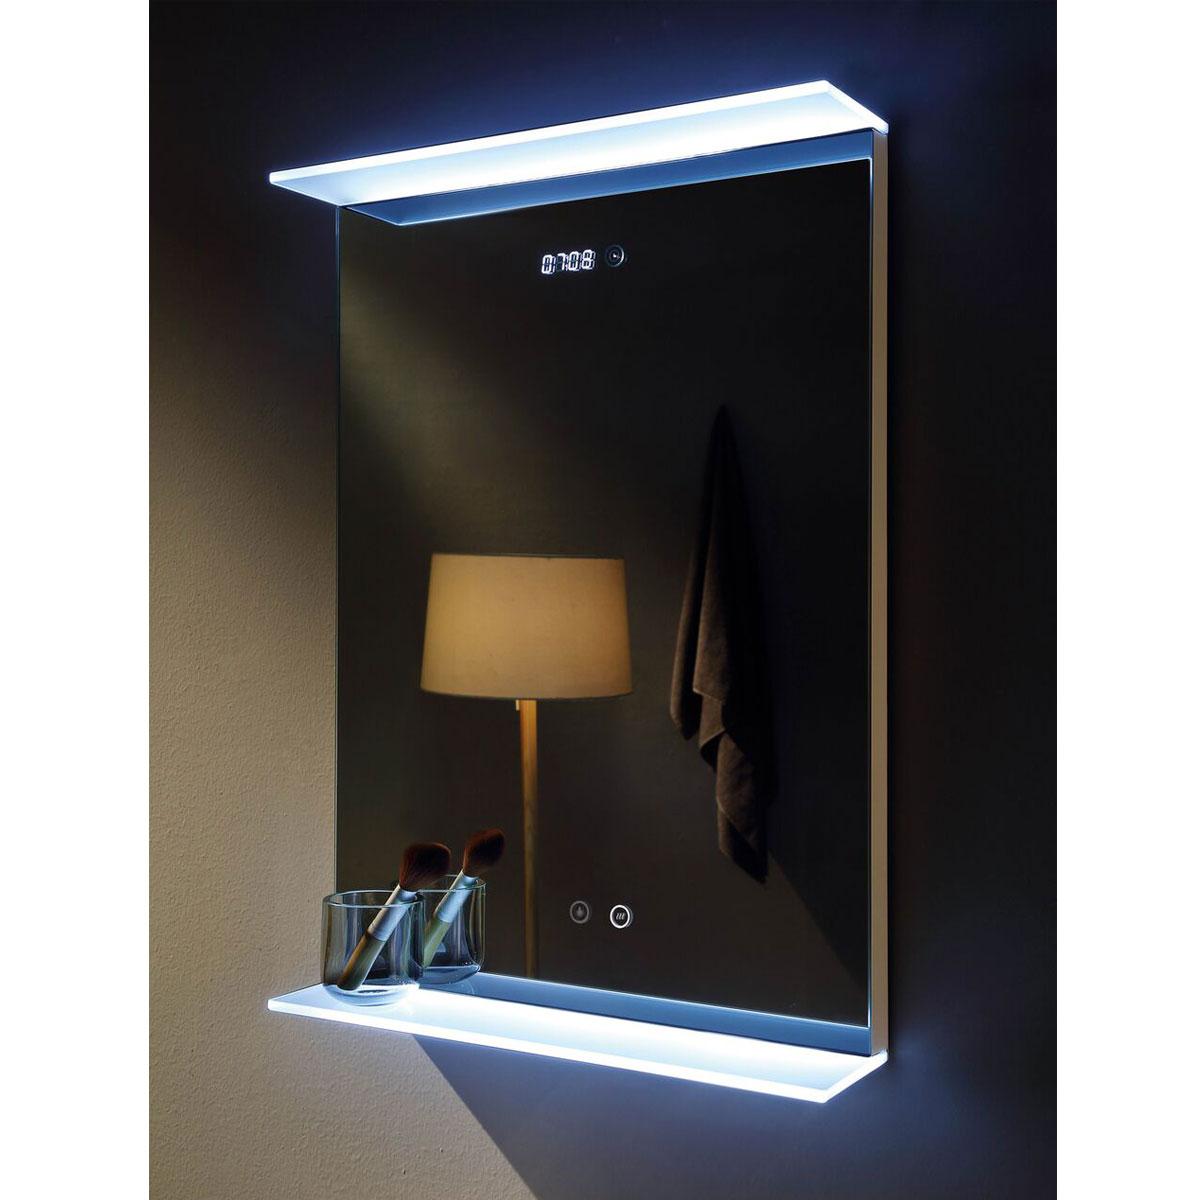 Nova Deluxe Led Illuminated Bathroom Mirror With Digital